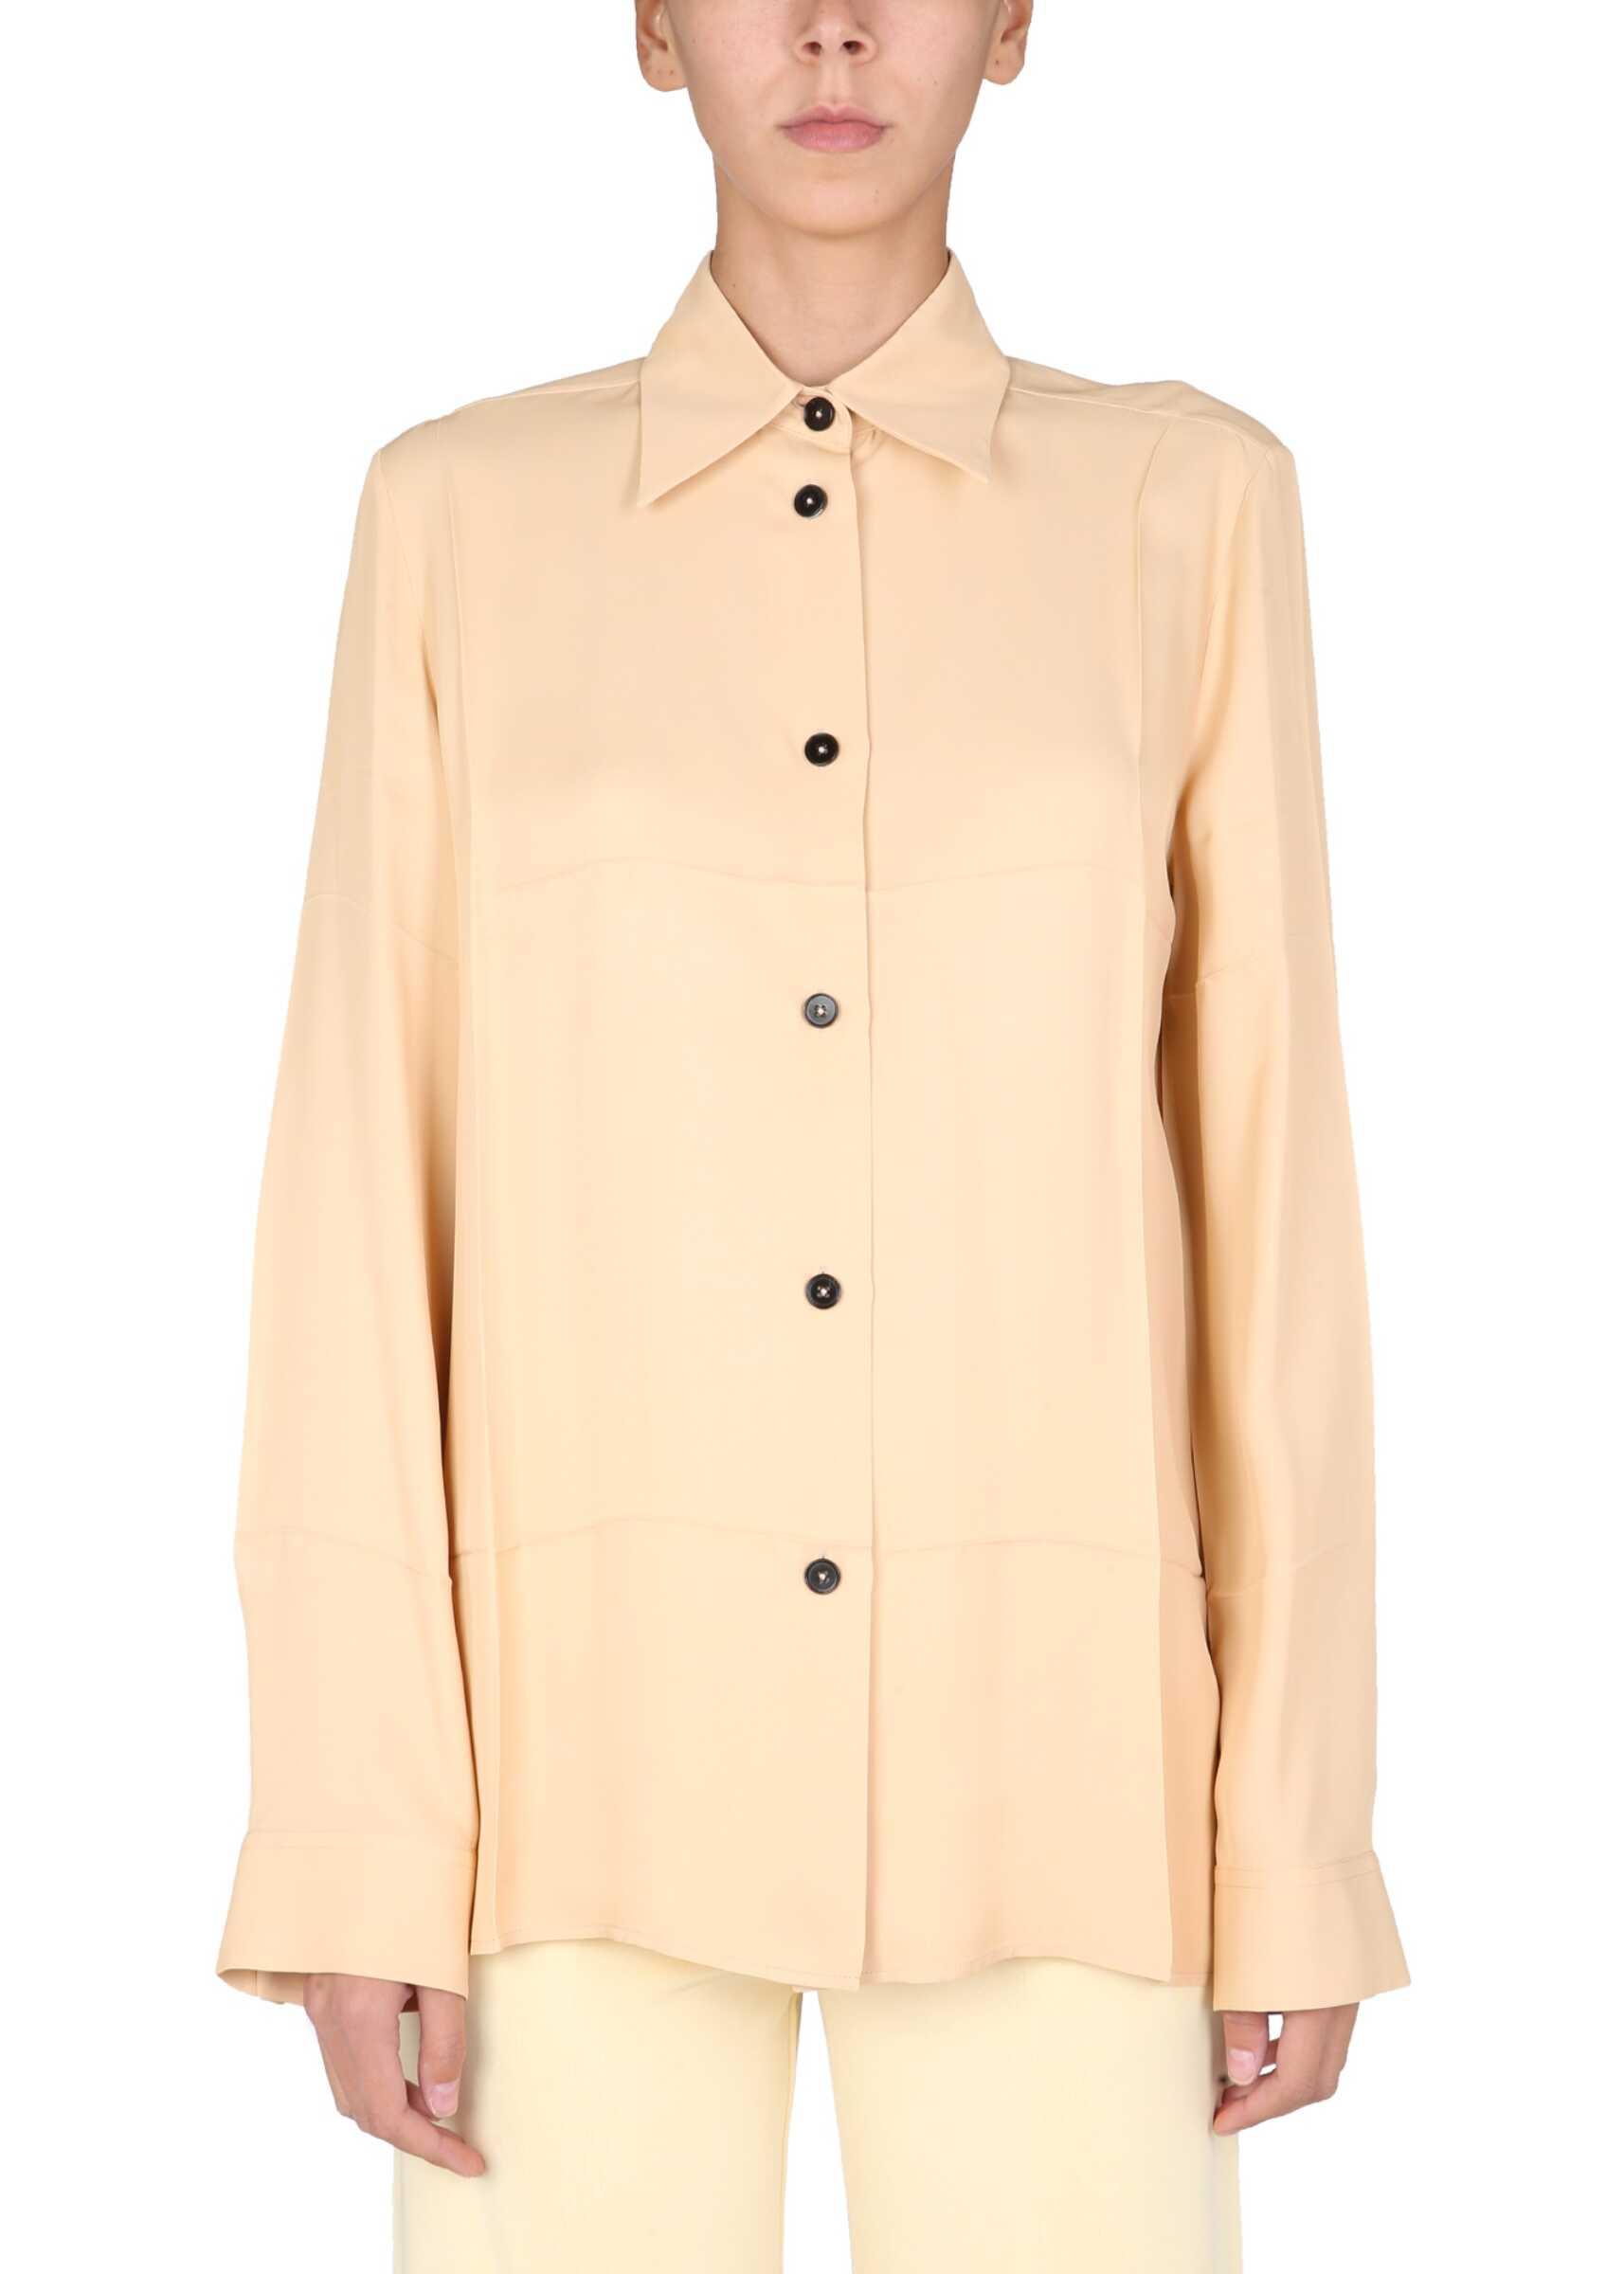 Jil Sander Boxy Fit Shirt JSWT605306_WT381500239 NUDE image0